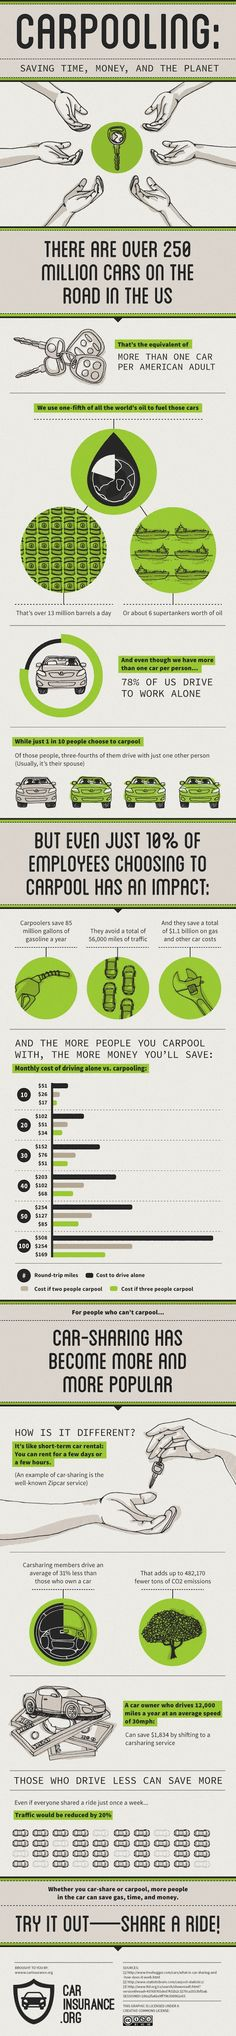 INFOGRAPHIC: 'Carpooling: Saving Time, Money And The Planet'   Gadling.com